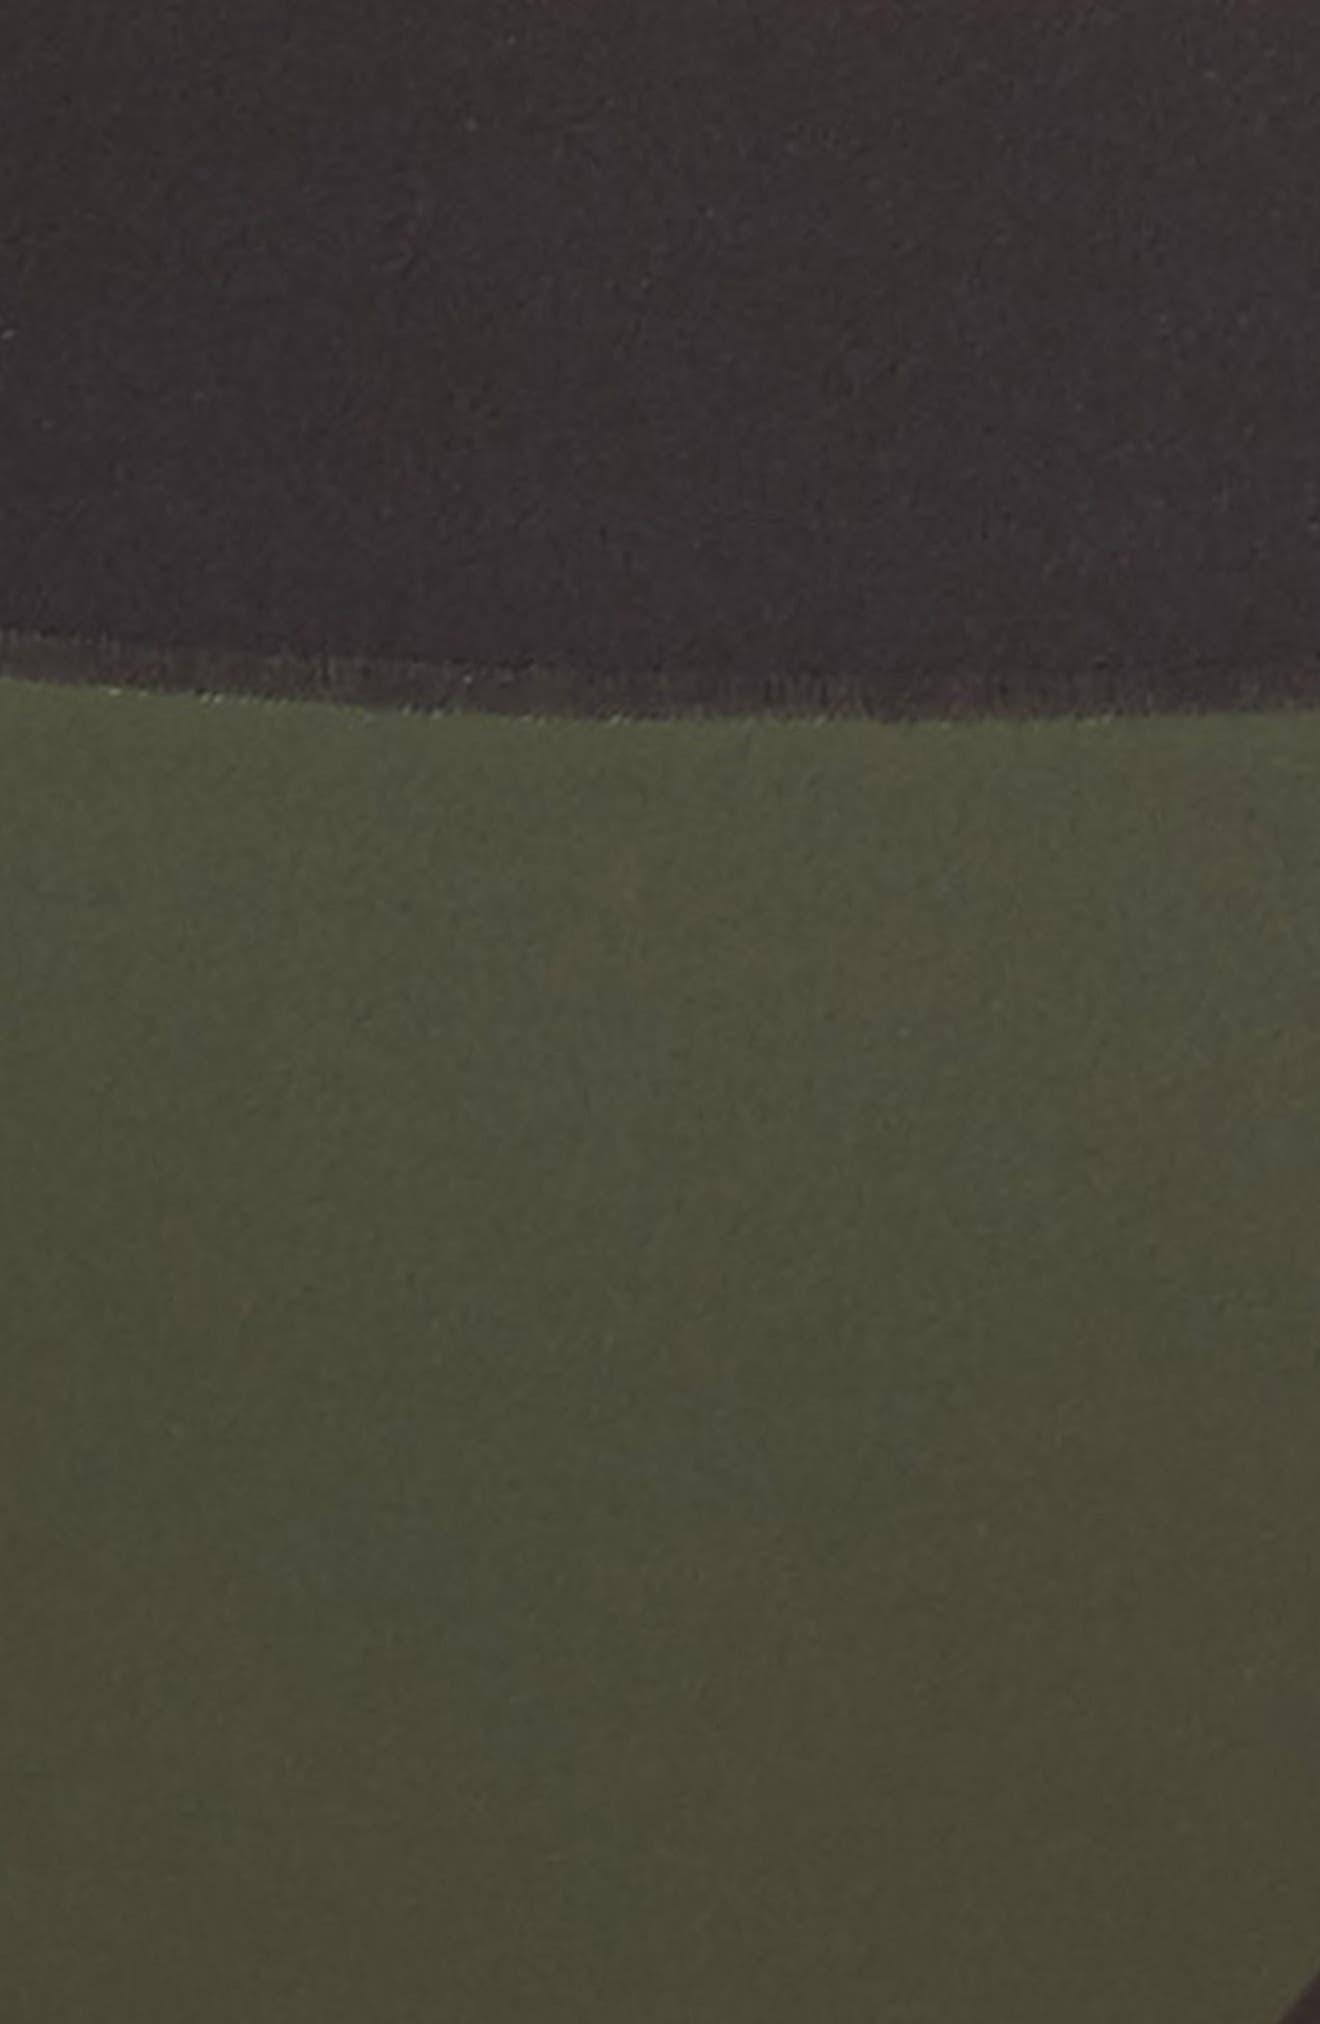 Reef Sport Mesh High-Waist Bikini Bottoms,                             Alternate thumbnail 5, color,                             302